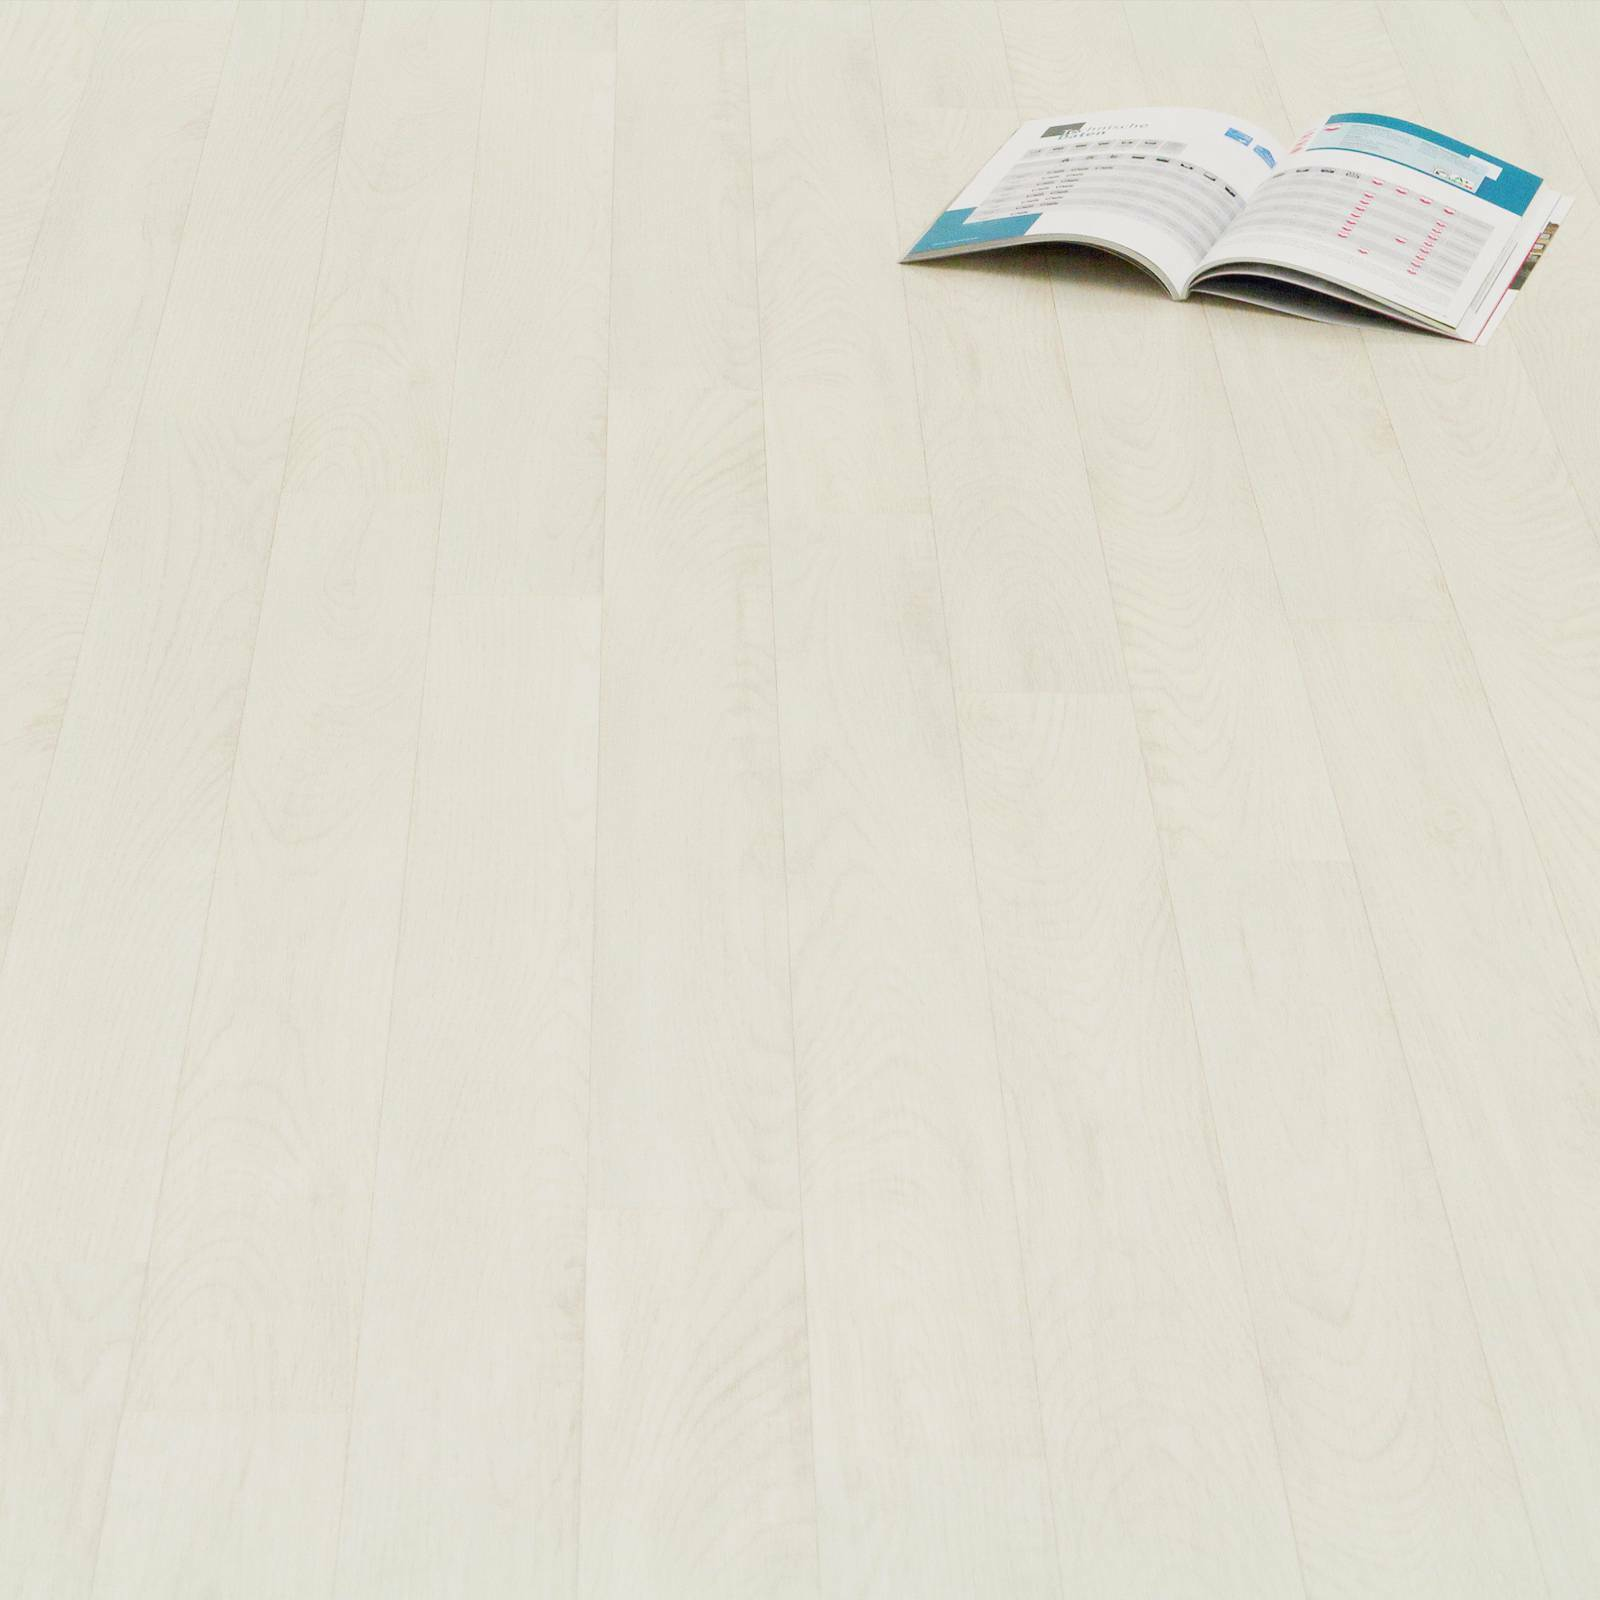 PVC CV Vinyl Bodenbelag Holz Planken Weiss Gekalkt Breite 3 m - 1m²